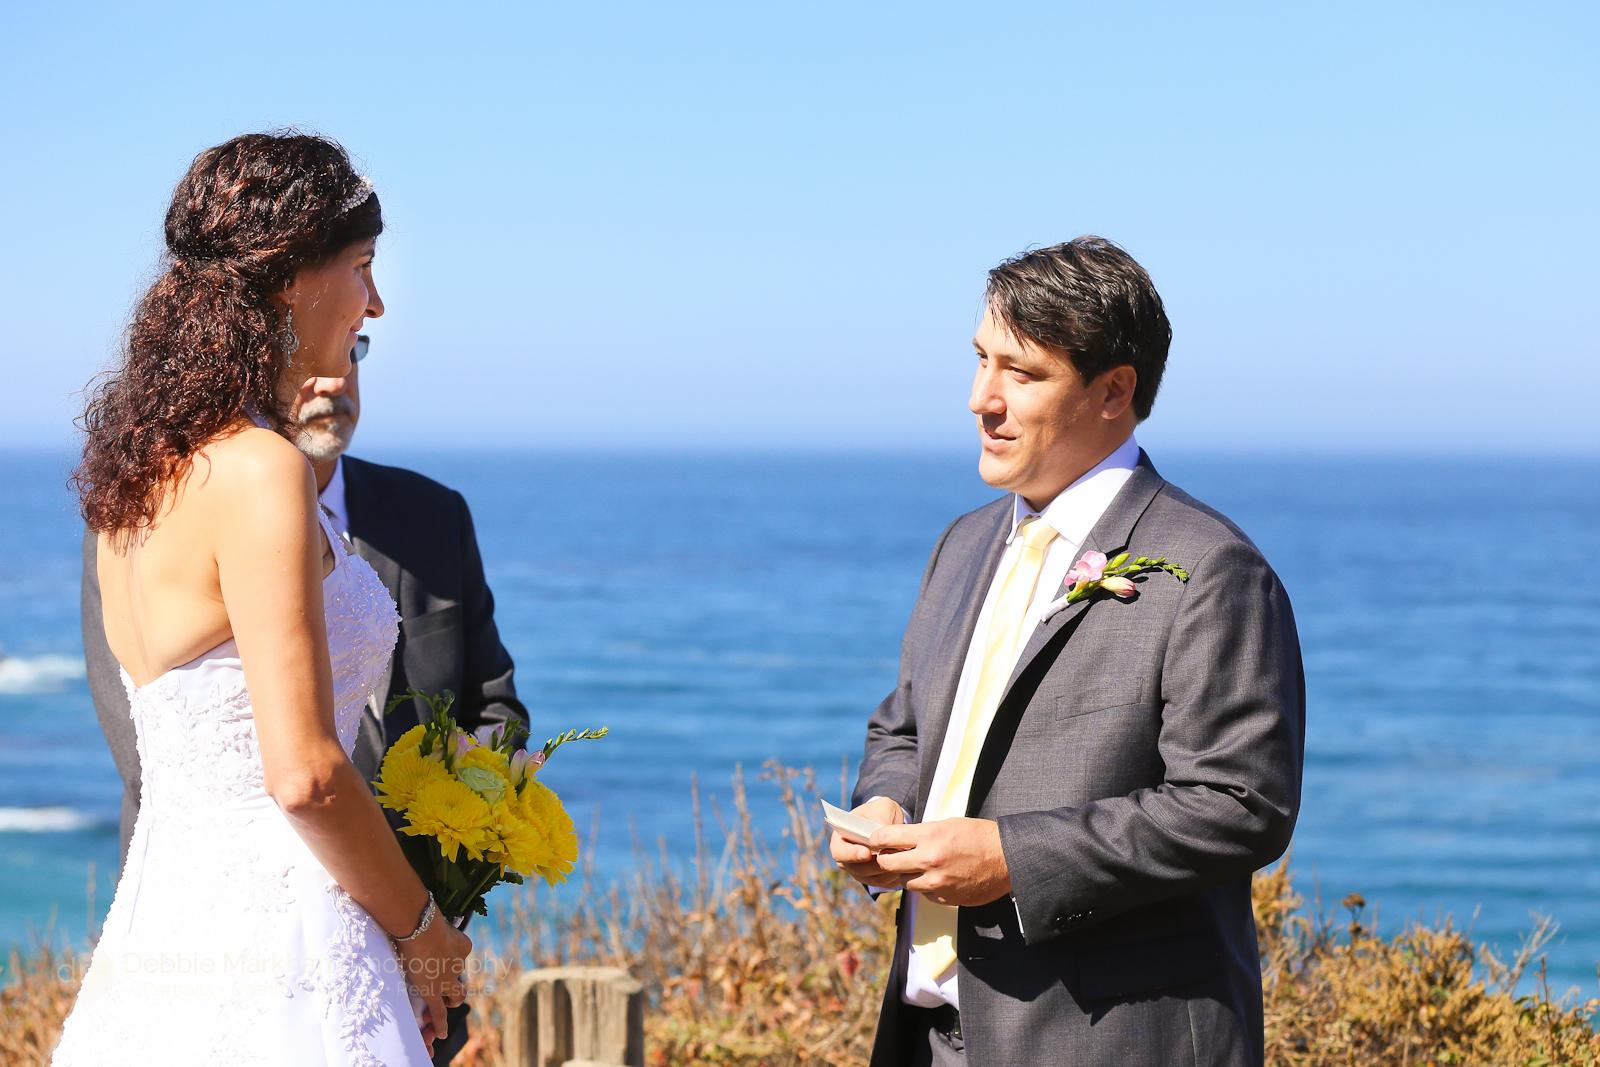 destination-wedding_small-wedding_big-sur_california-coast_ocean-view_gorda_wedding-photographer_debbie-markham-8648